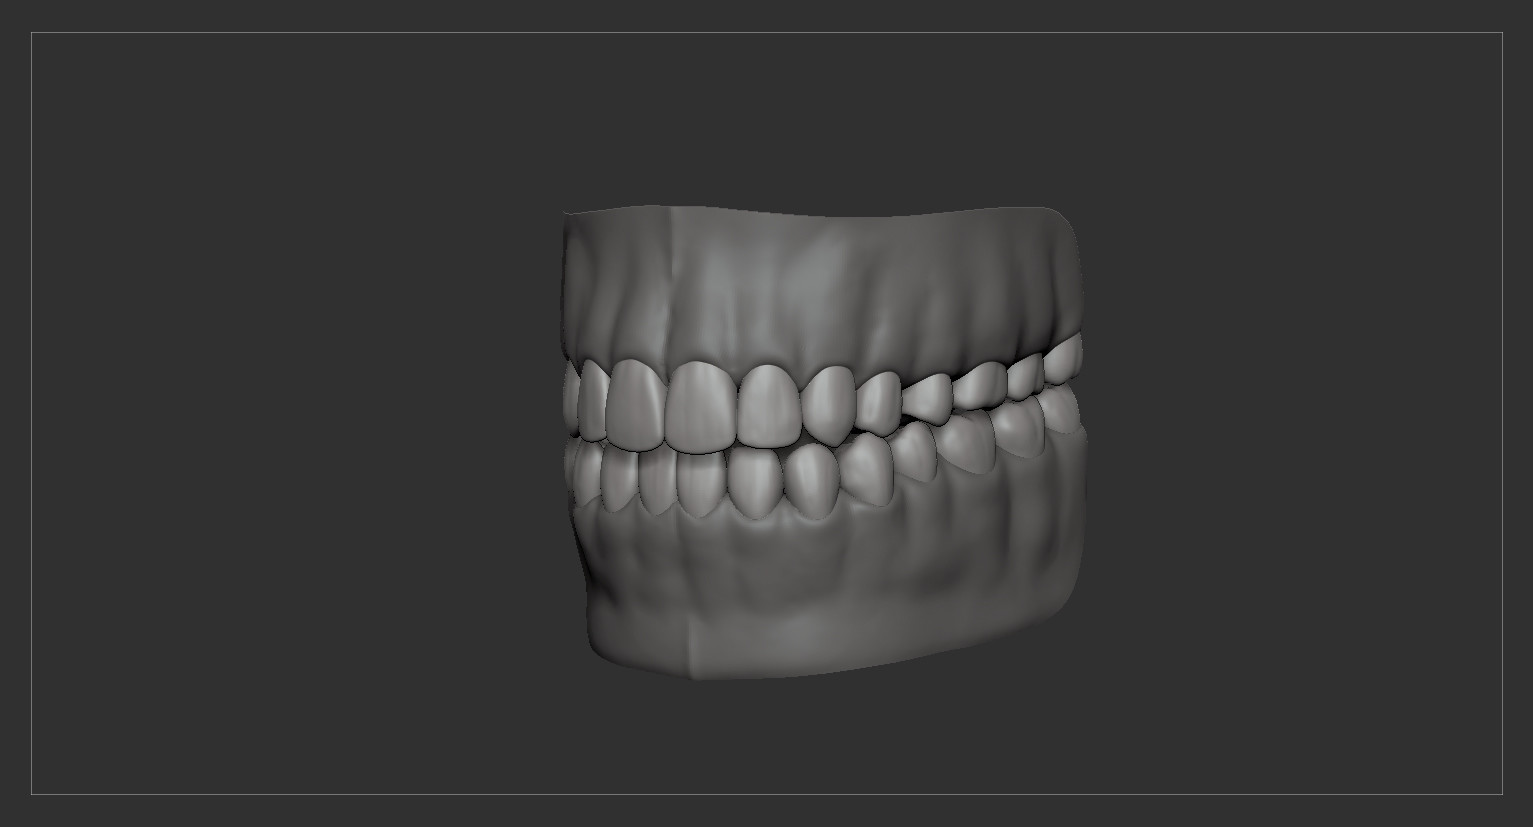 ZBrush - Teeth